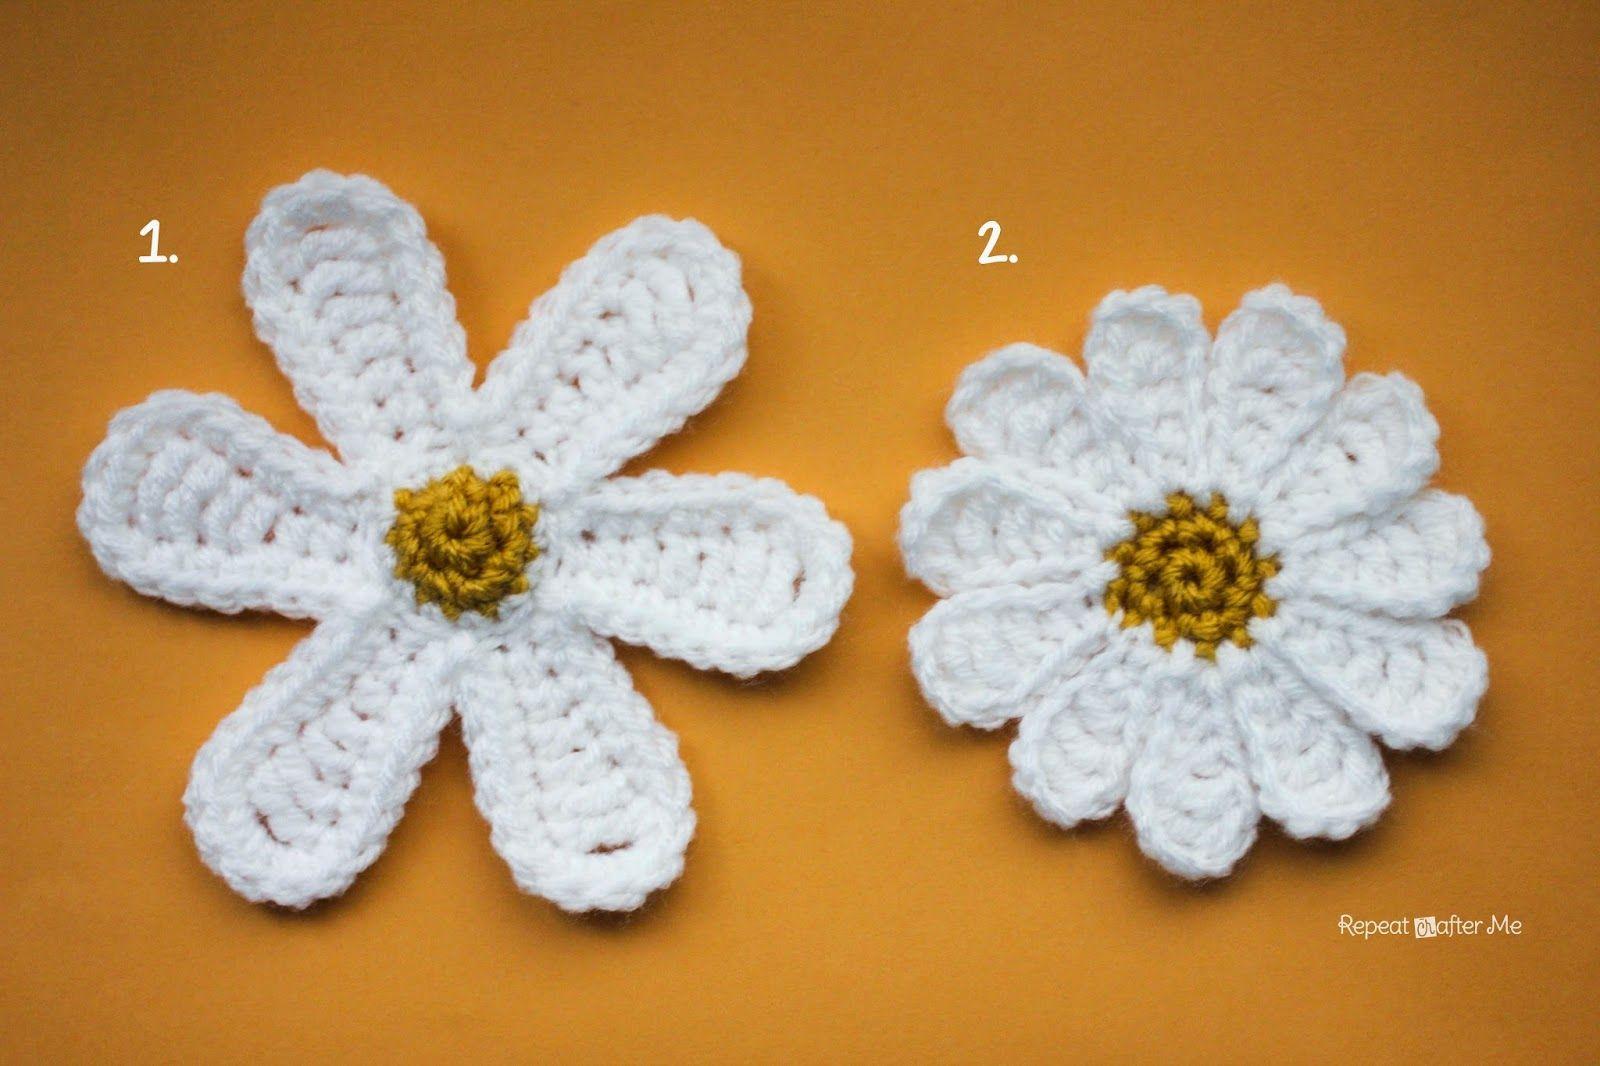 Daisy flower crochet pattern daisy flowers free pattern and two daisy flowers free patternsteresa restegui httppinterestteretegui izmirmasajfo